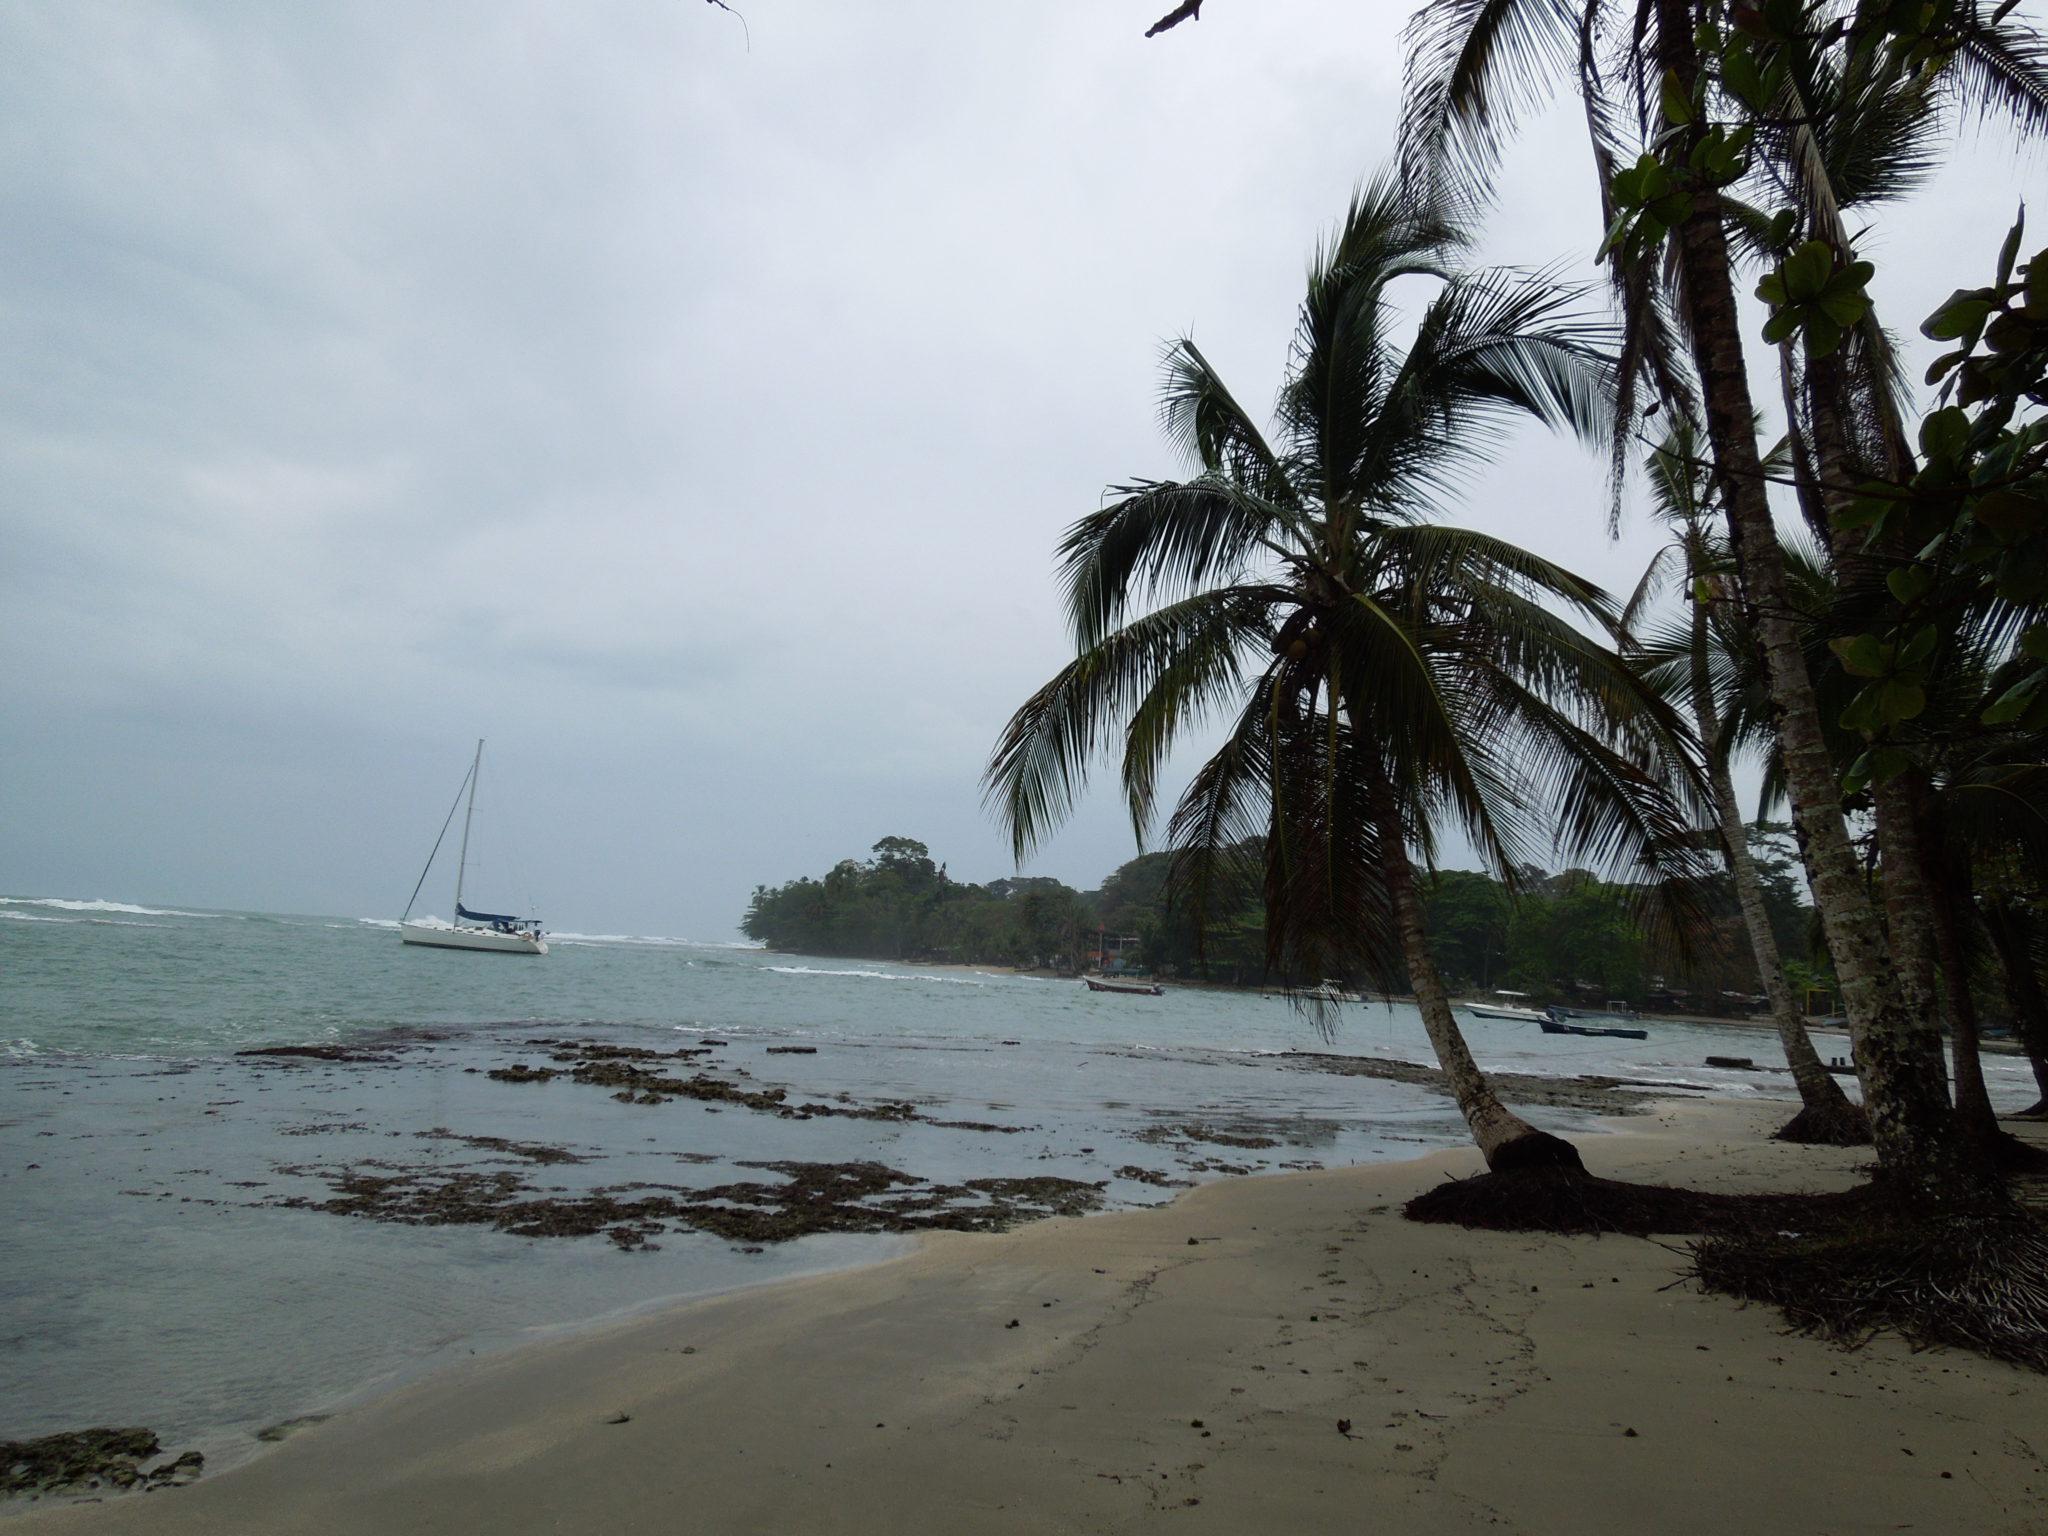 Puerto Viejo – Cahuita – Manzanillo